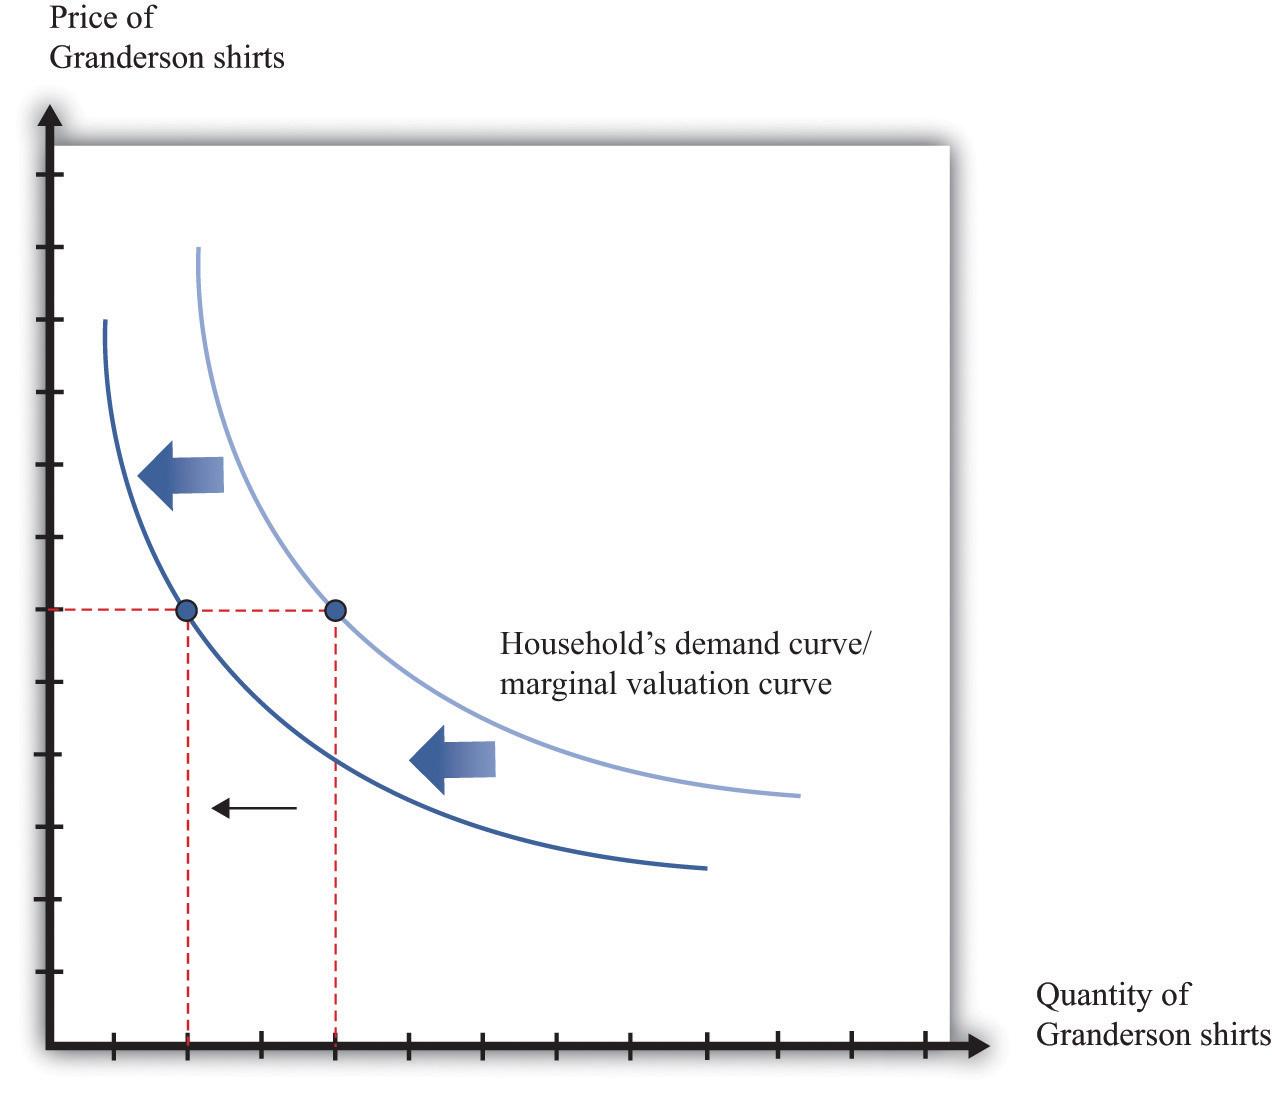 microeconomics theory through applications v1 0 1 flatworld. Black Bedroom Furniture Sets. Home Design Ideas